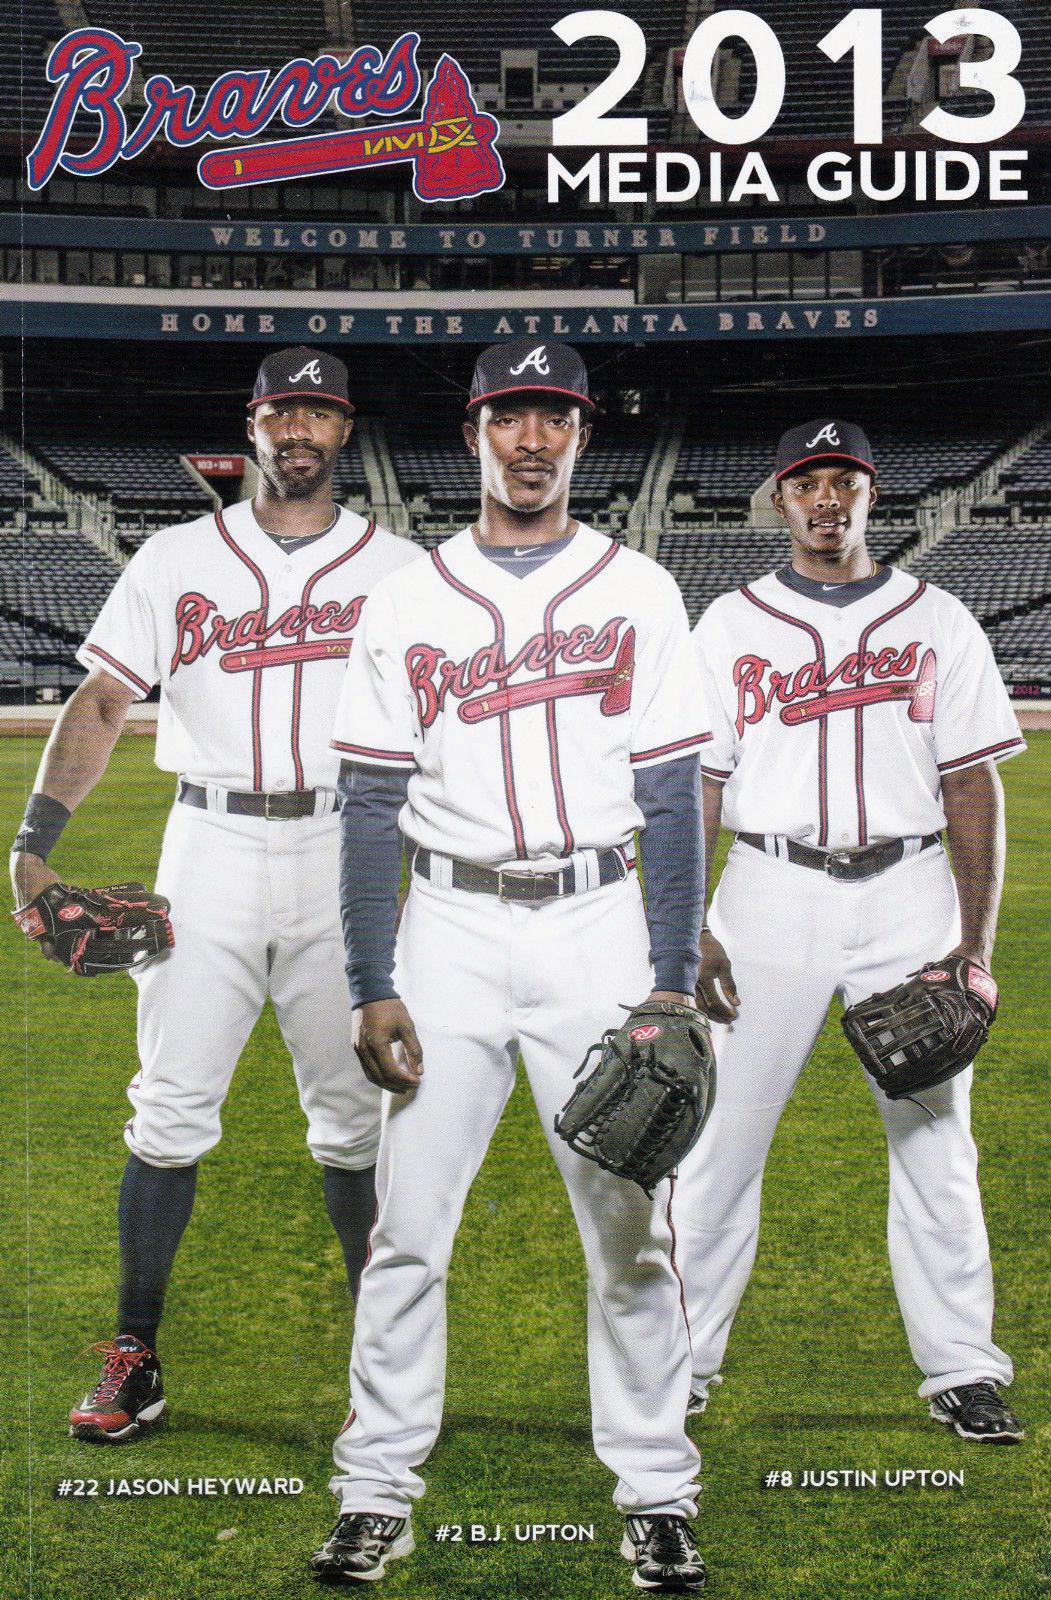 Atlanta Braves Media Guide Media Guide (2013) -  SportsLogos.Net